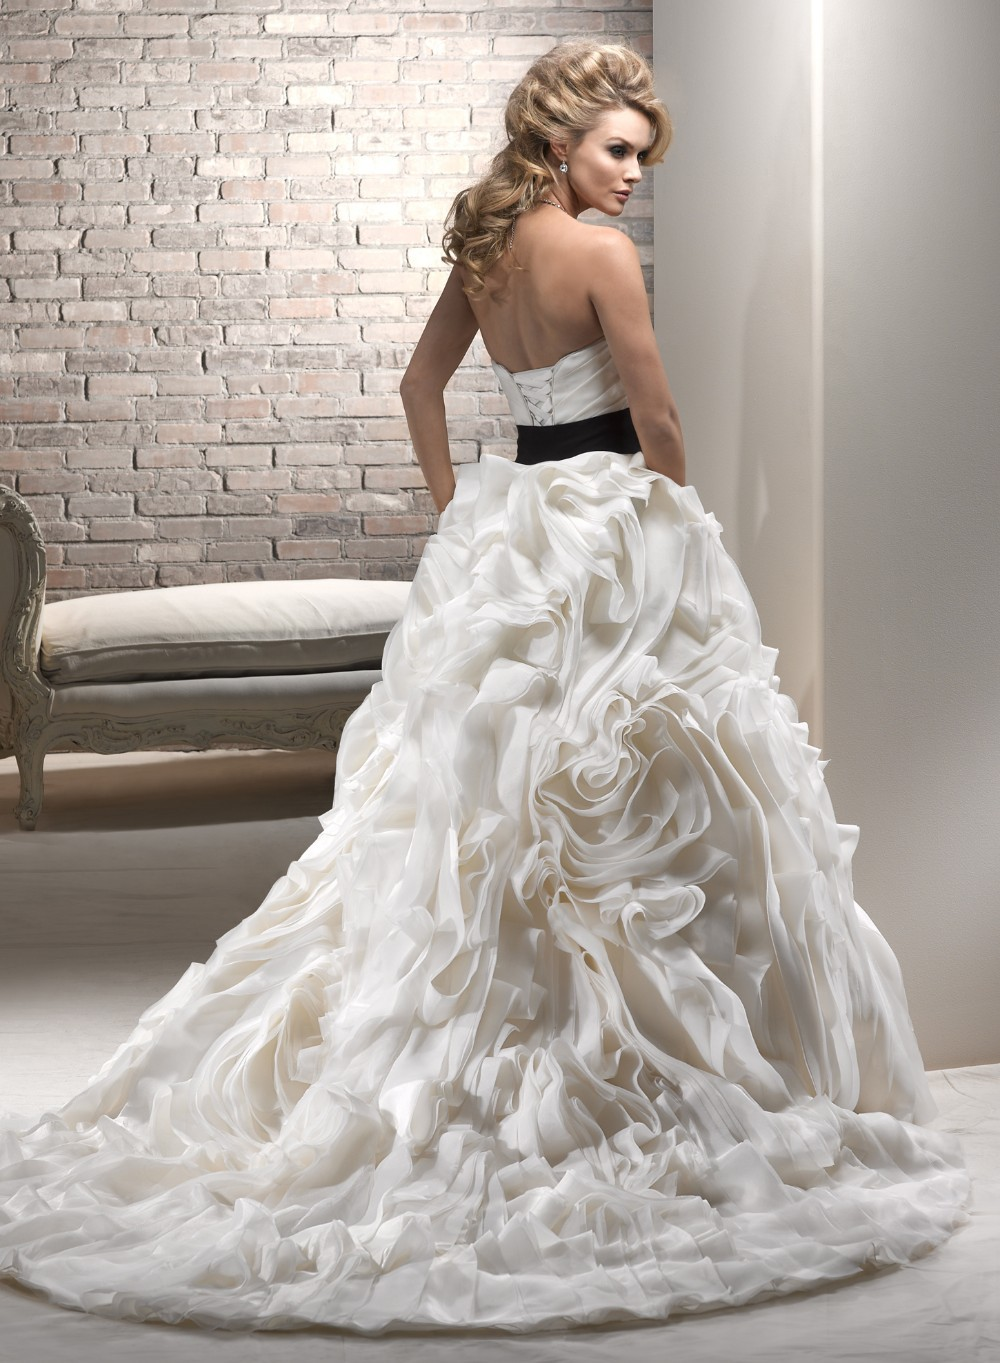 Платья своими руками без швов